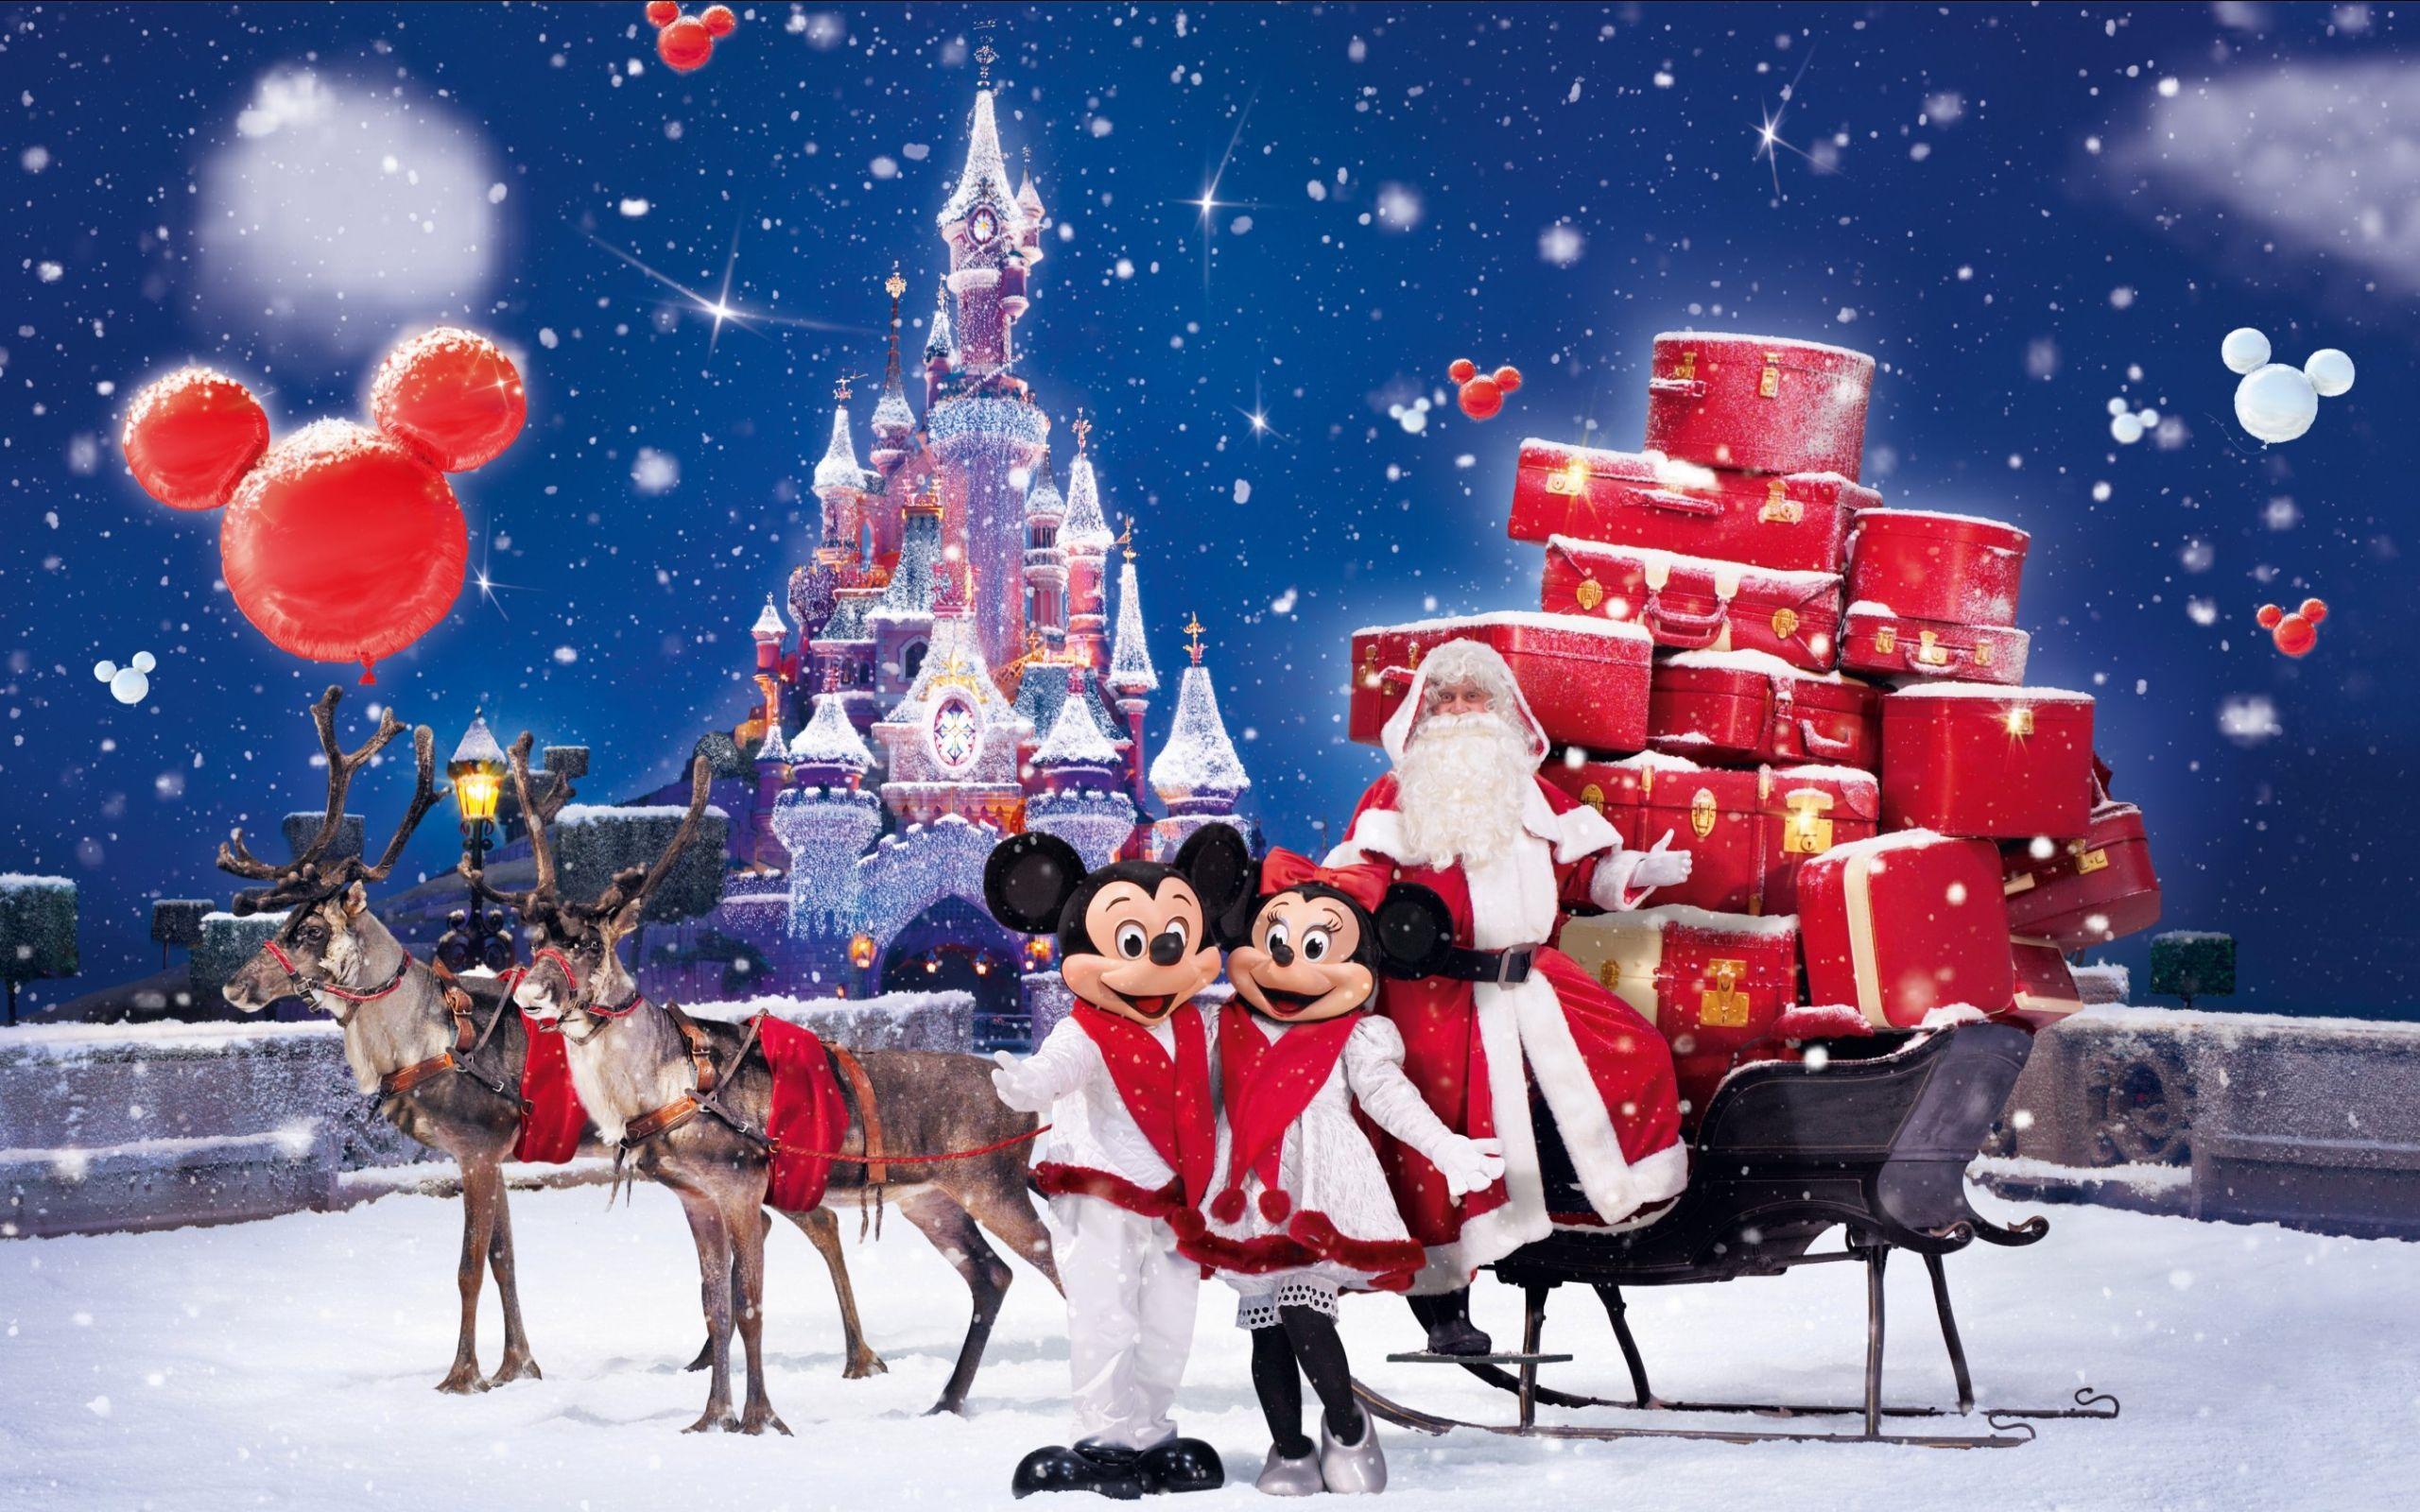 Christmas Computer Wallpapers Desktop Backgrounds 2560x1600 Id 471564 Disneyland Christmas Disney Christmas Happy Merry Christmas